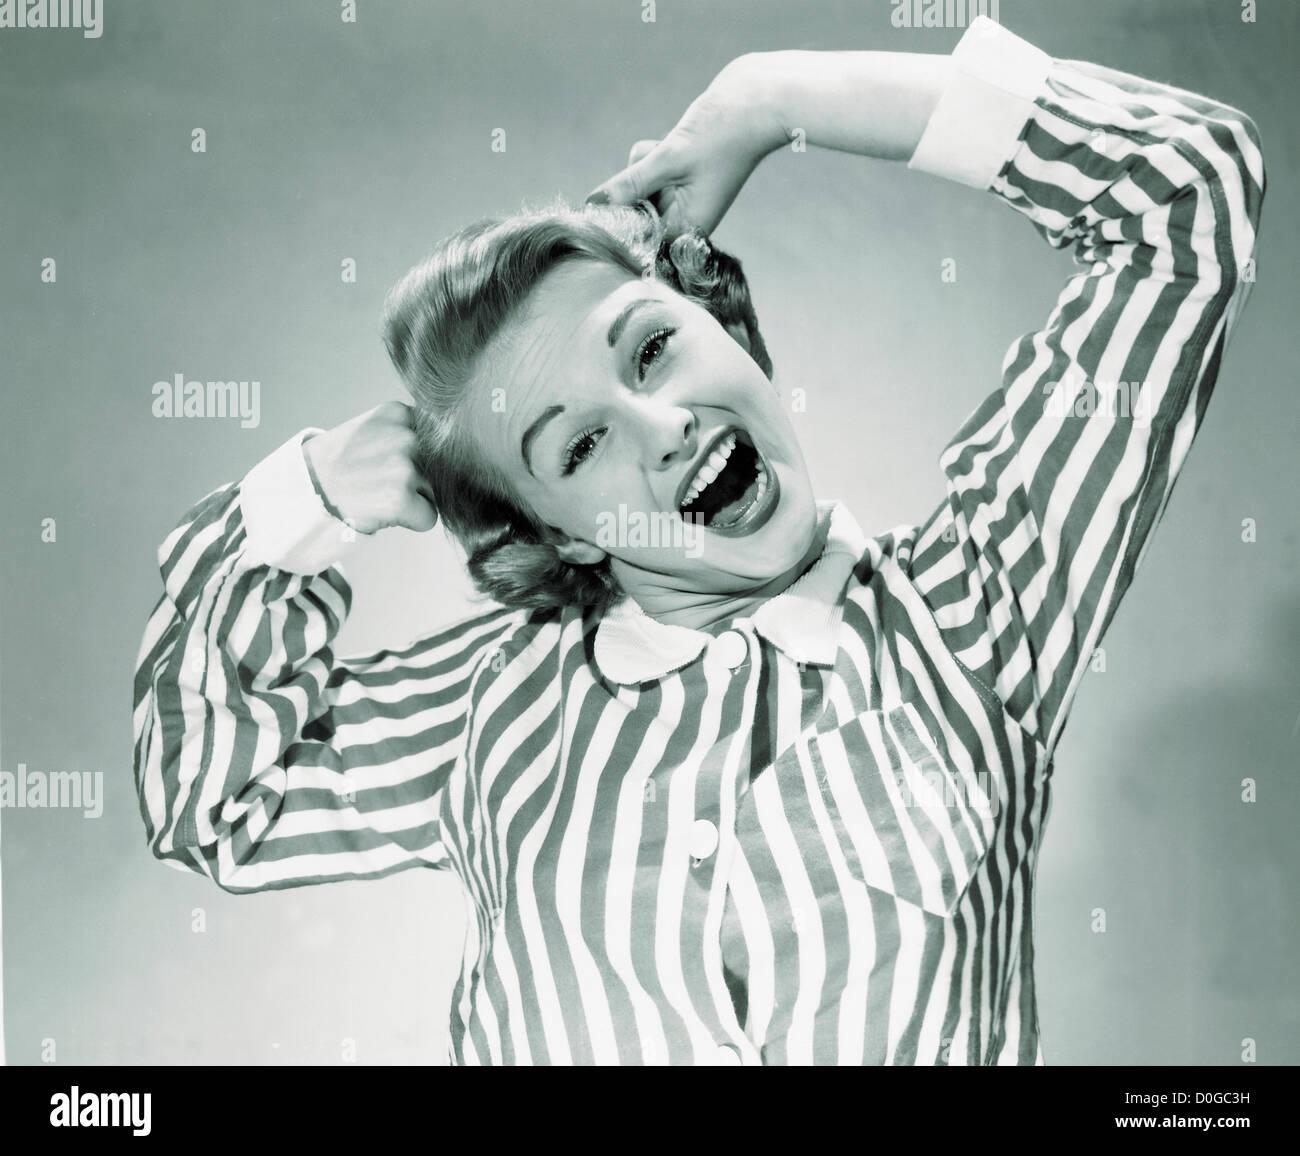 Black and white print of woman yawning - Stock Image